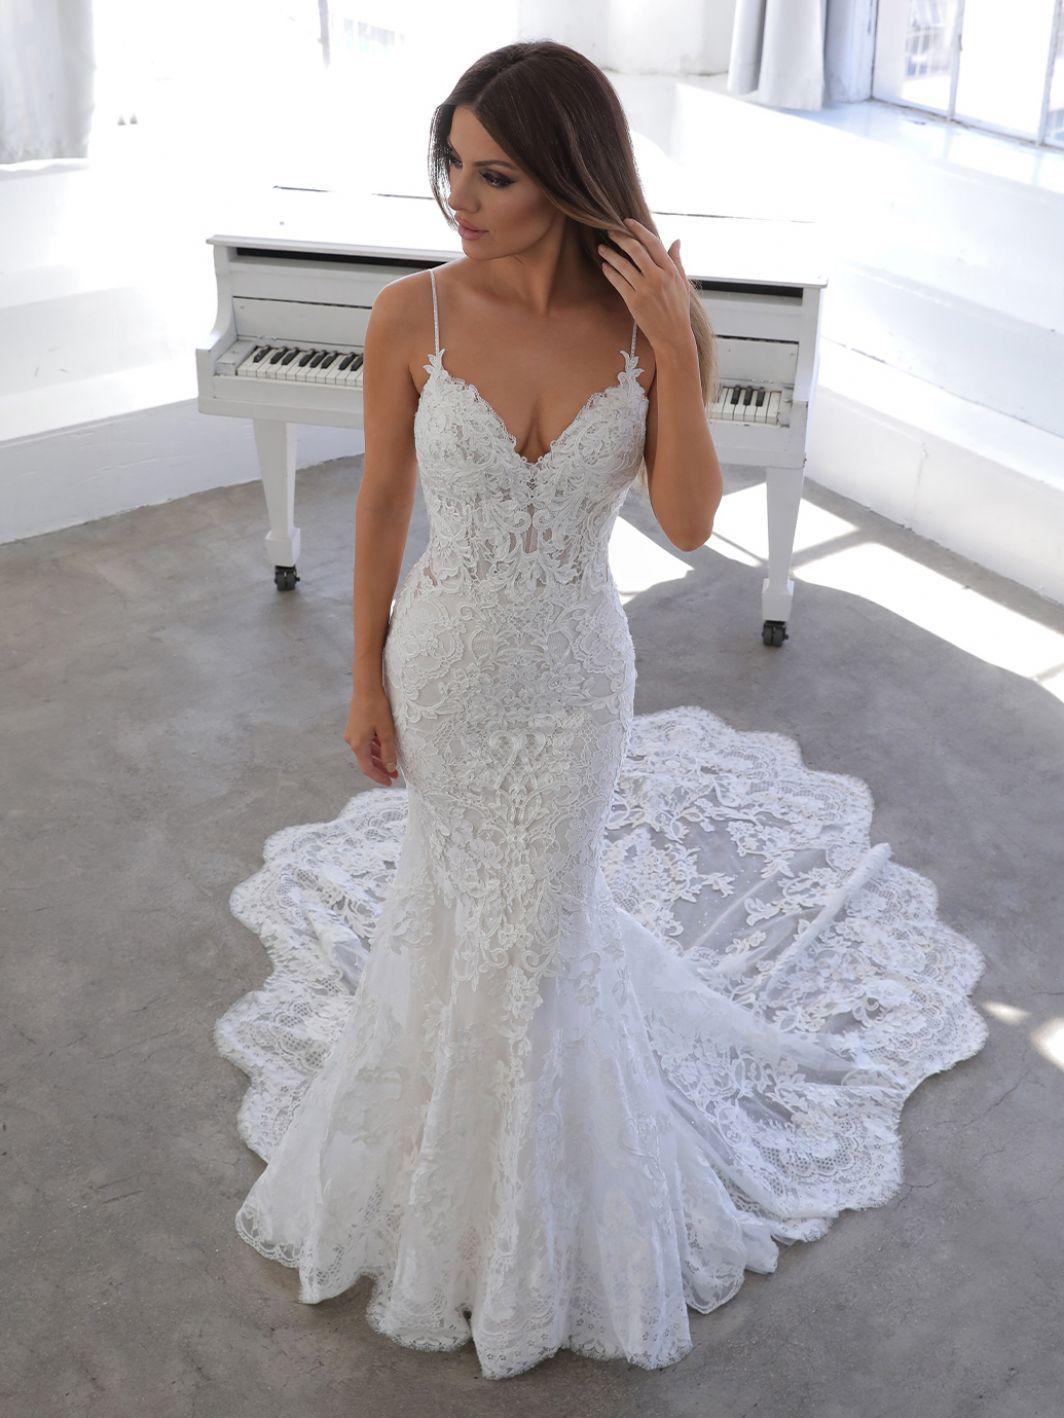 Nini 2021 Blue By Enzoani Enzoani Dream Wedding Ideas Dresses Wedding Dresses Lace Wedding Dresses [ 1418 x 1064 Pixel ]